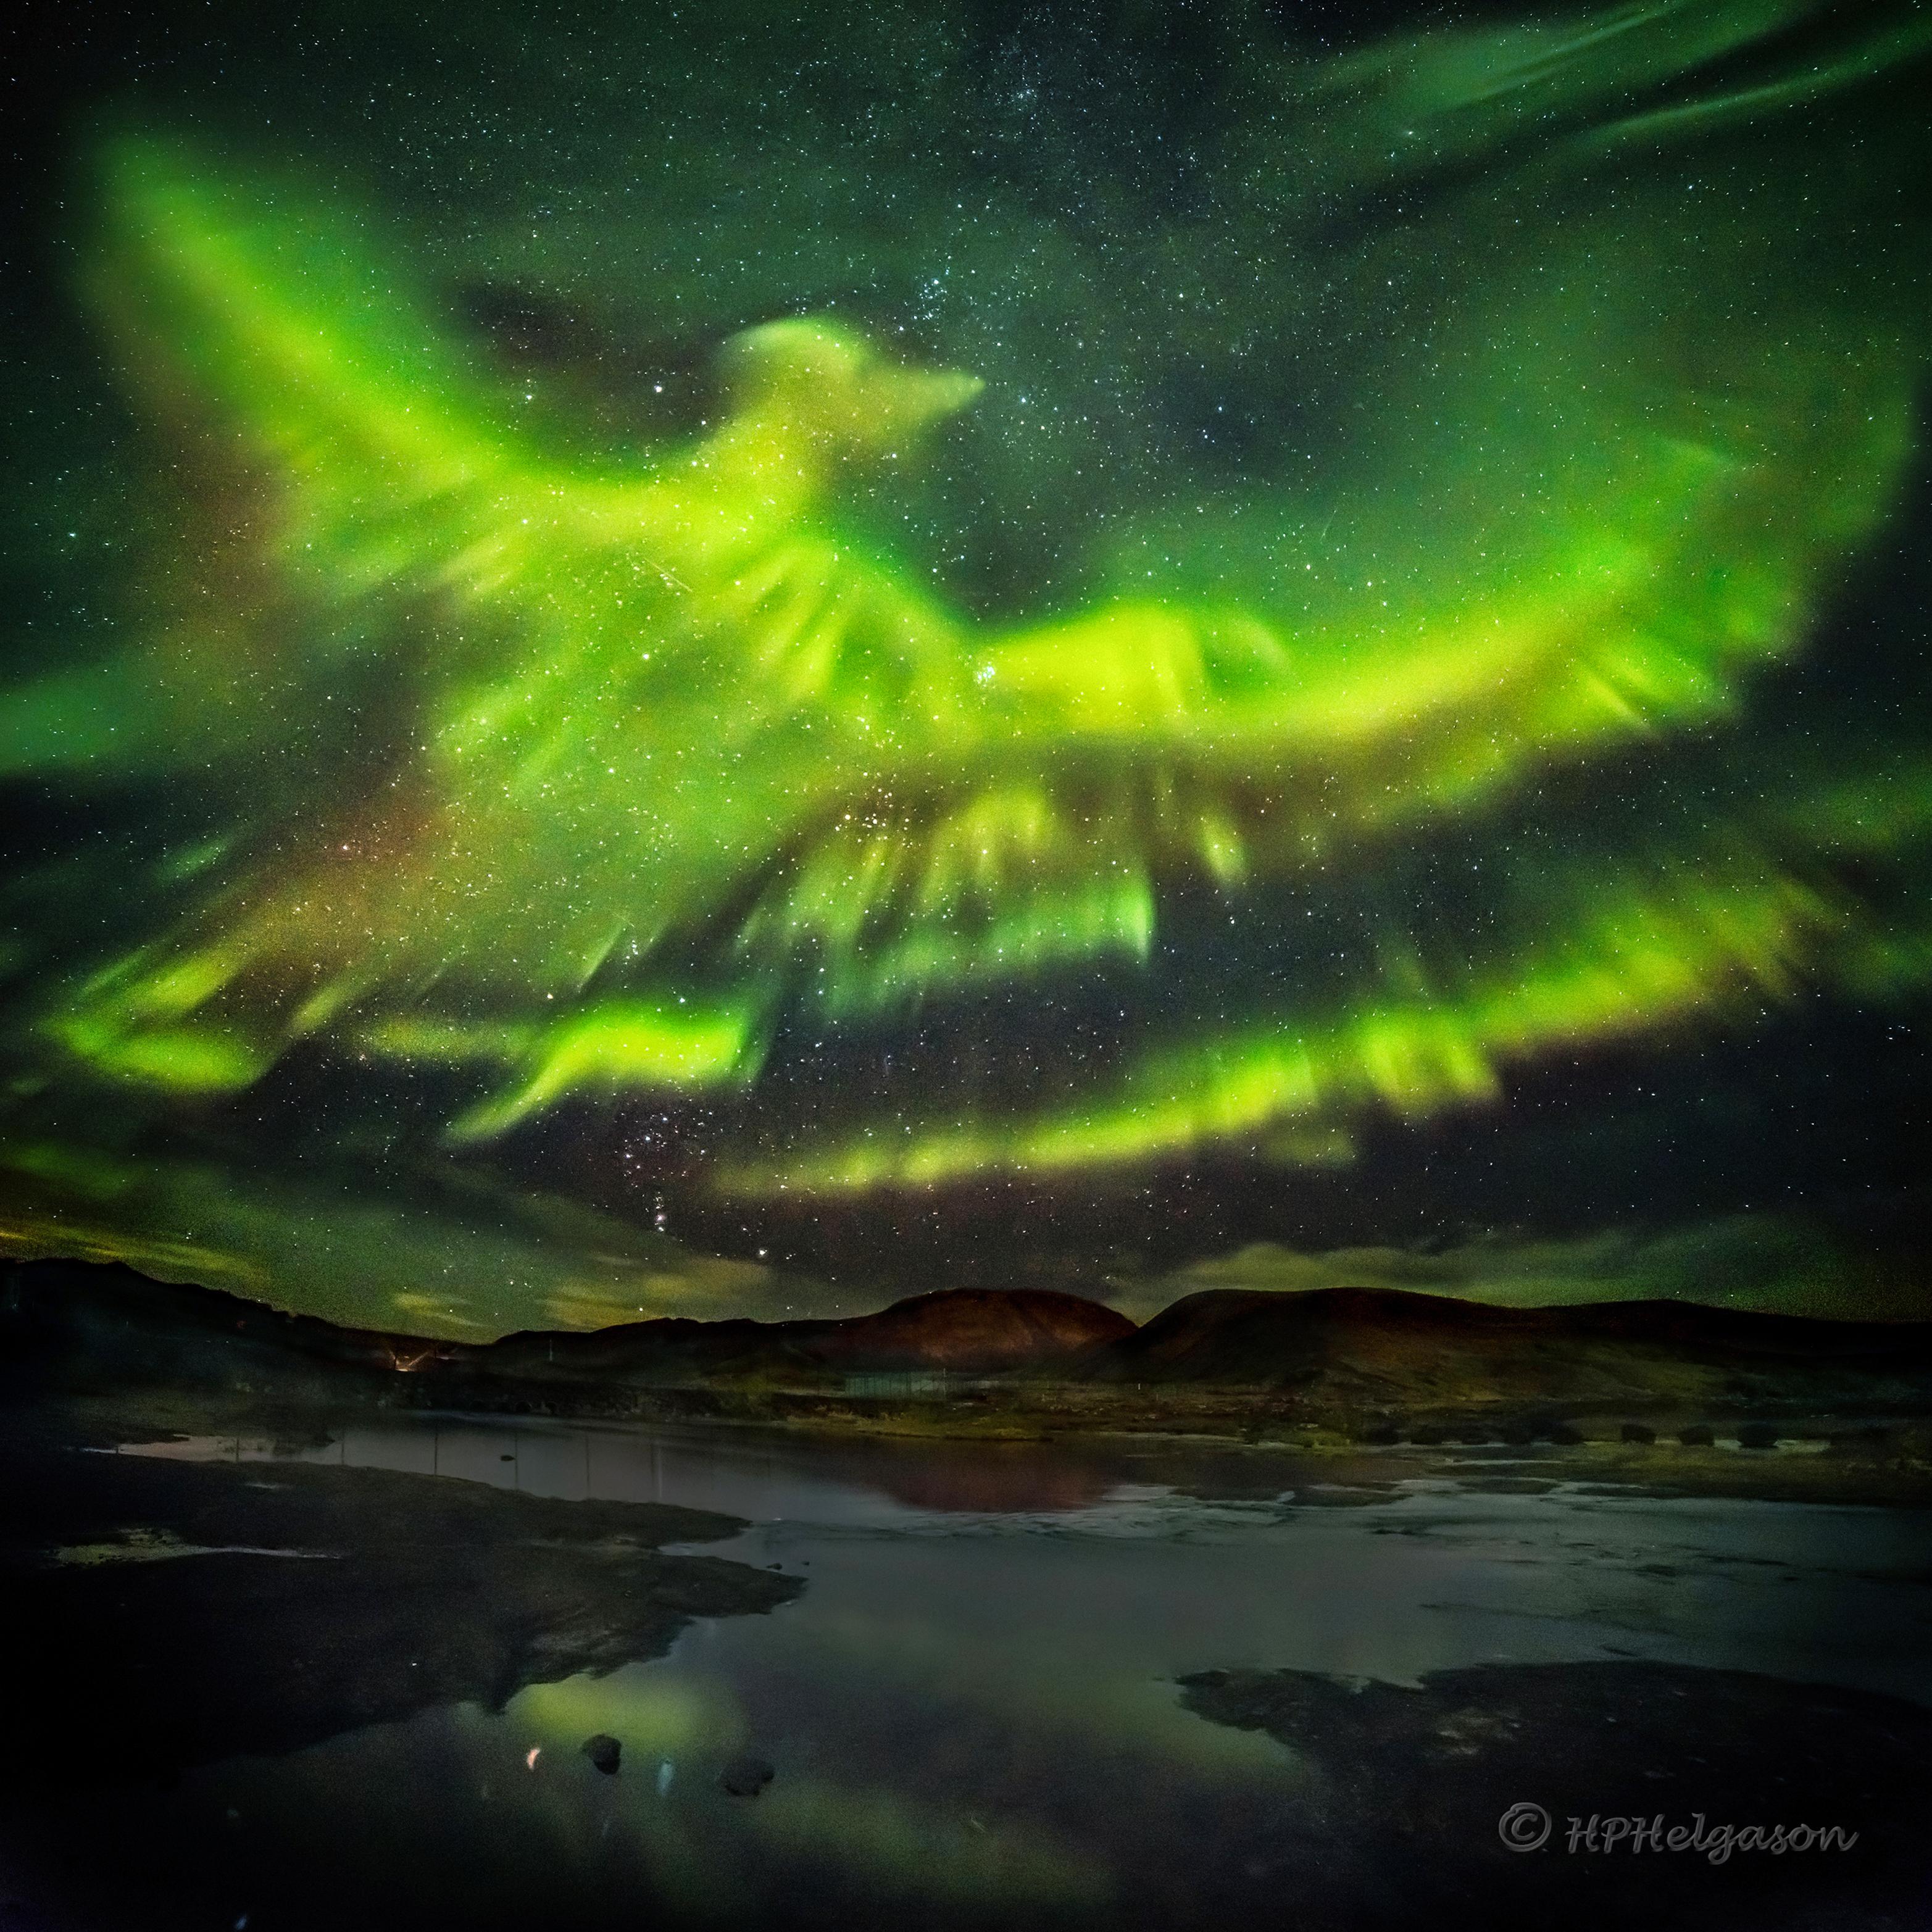 http://www.astro.cz/apod_data/2016/03/PhoenixAurora_Helgason_3130.jpg